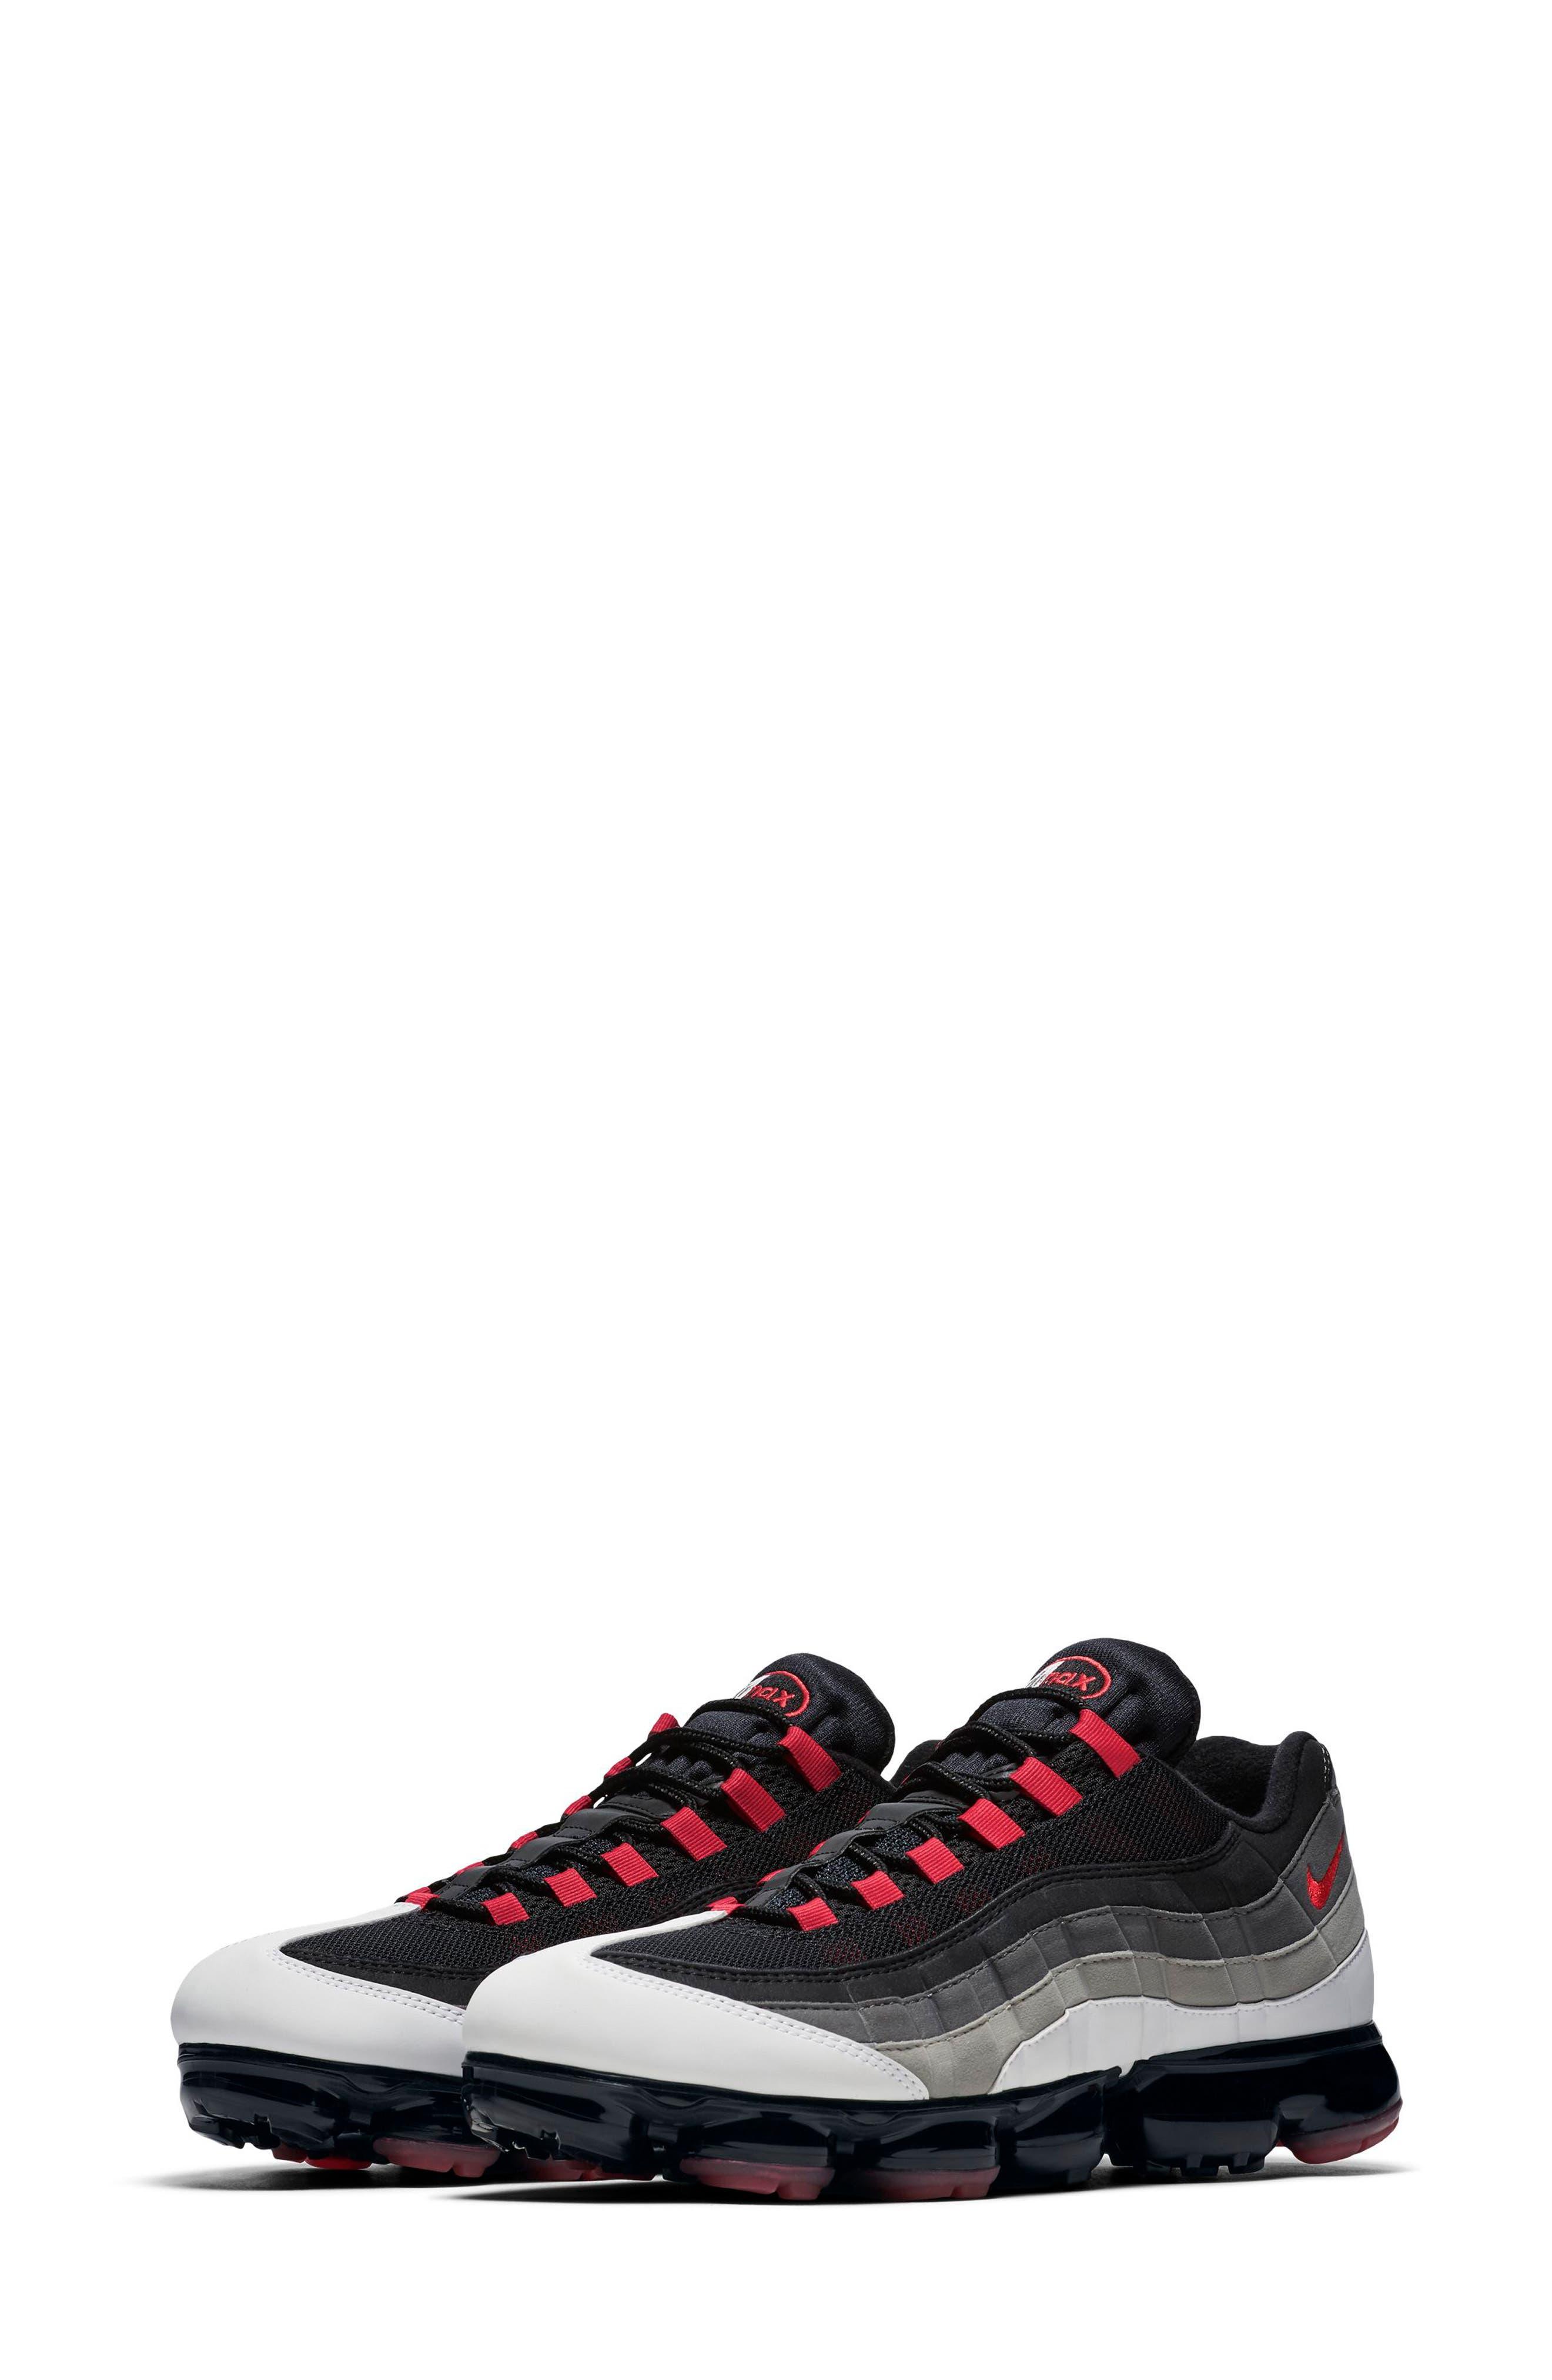 Air VaporMax '95 Sneaker,                         Main,                         color, WHITE/ RED/ PEWTER/ GRANITE